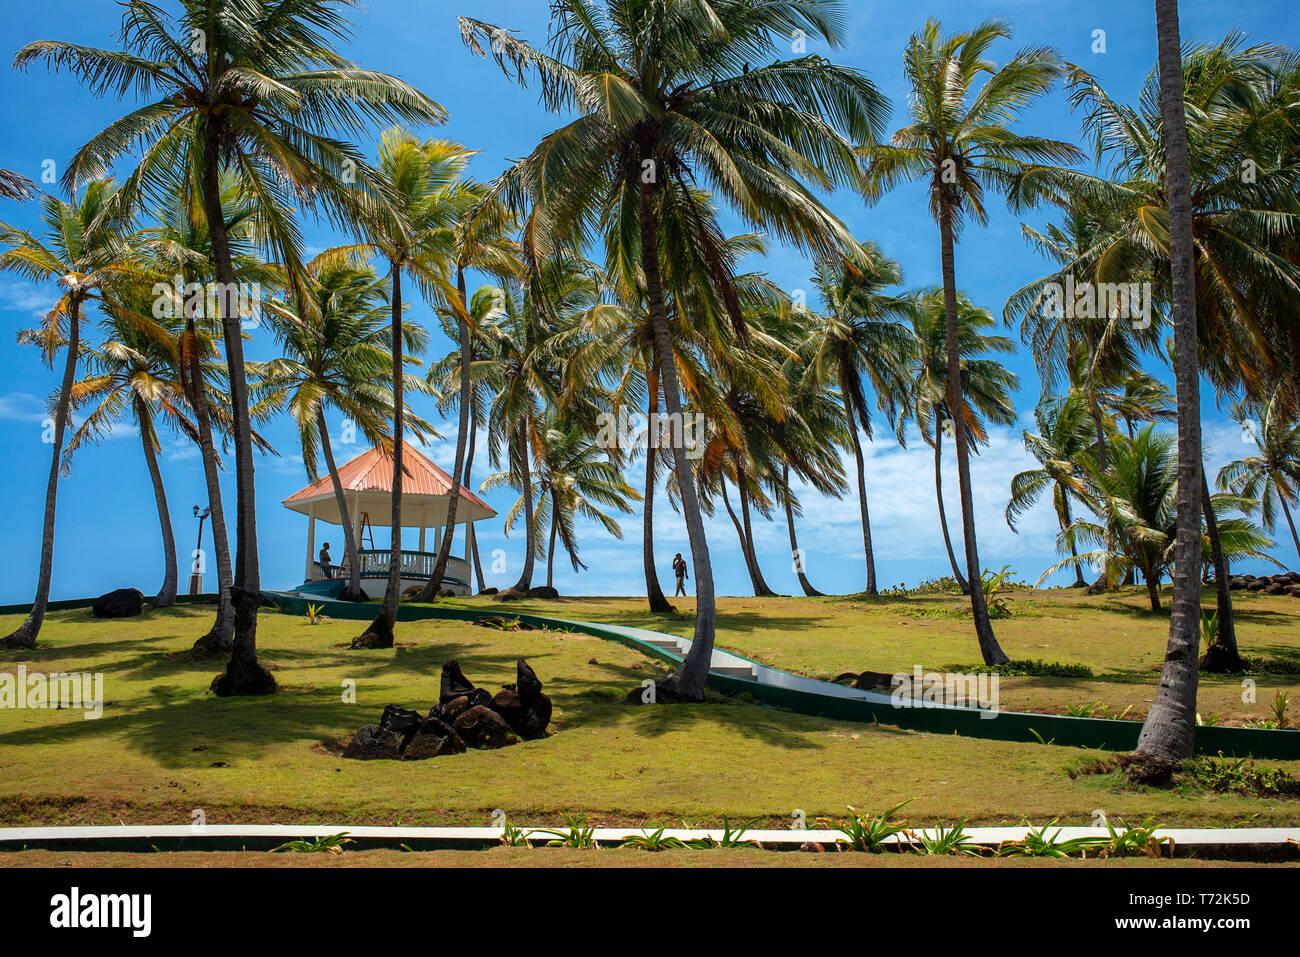 Weekend house of President Daniel Ortega, Big Corn Island, Caribbean Sea, Nicaragua, Central America Stock Photo